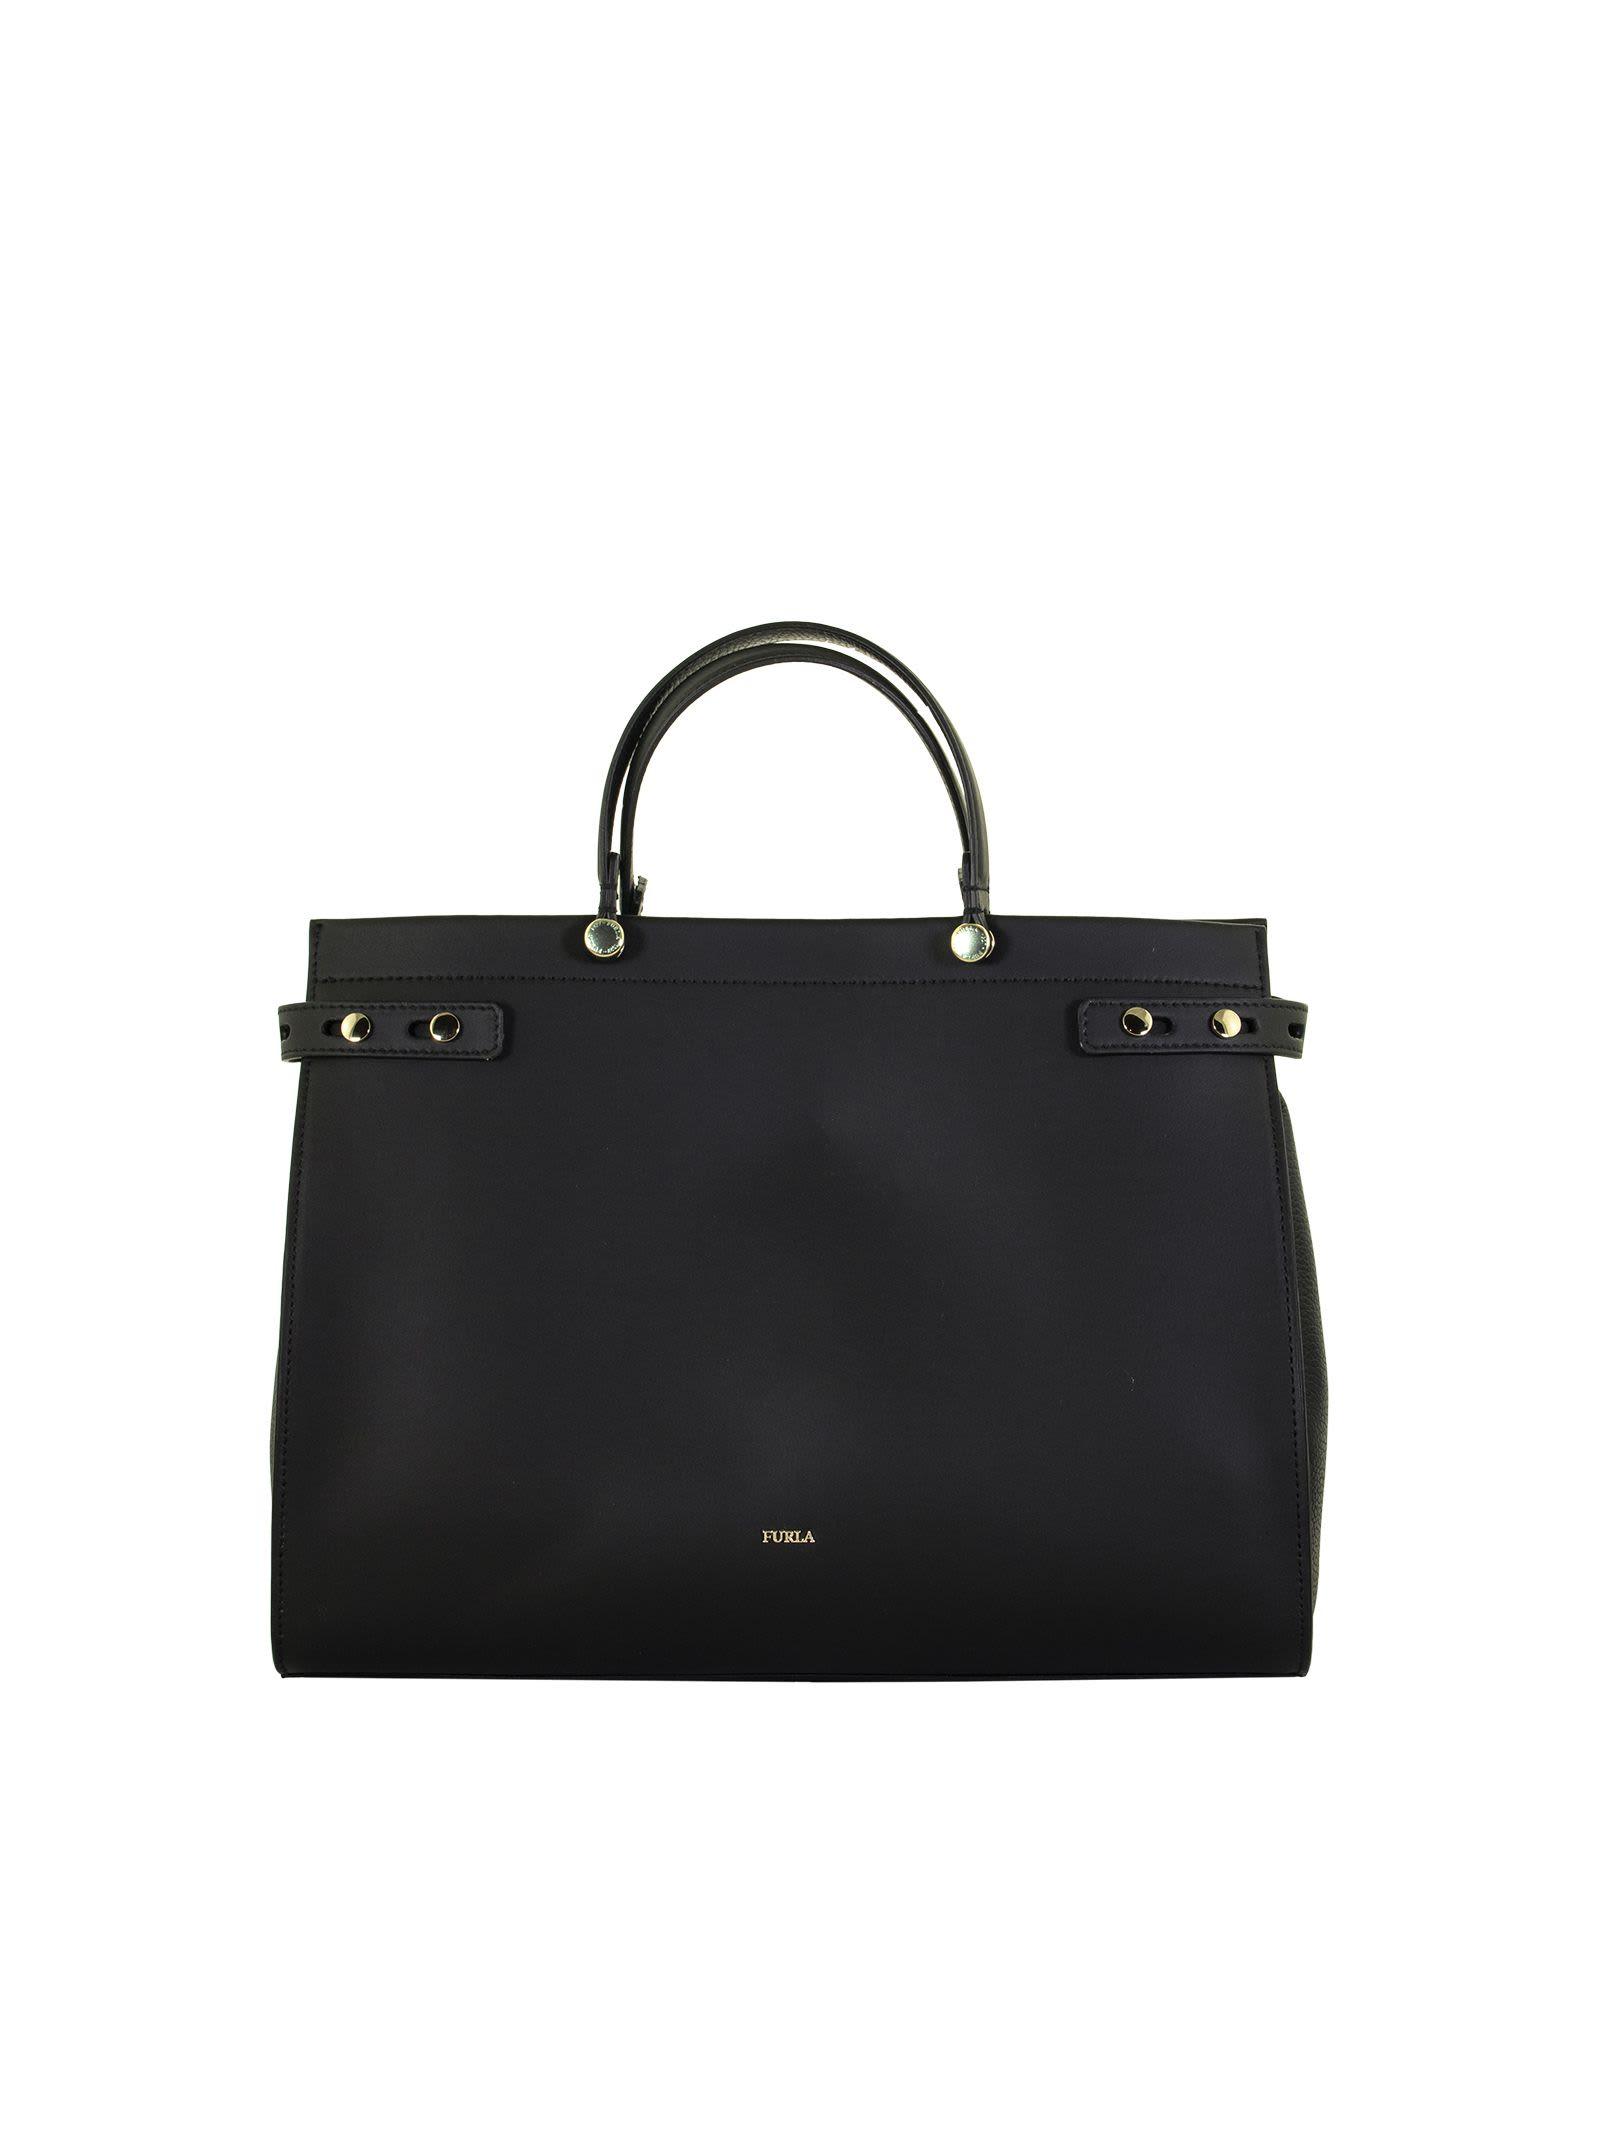 Furla Lady M L Tote Onyx Bag Leather